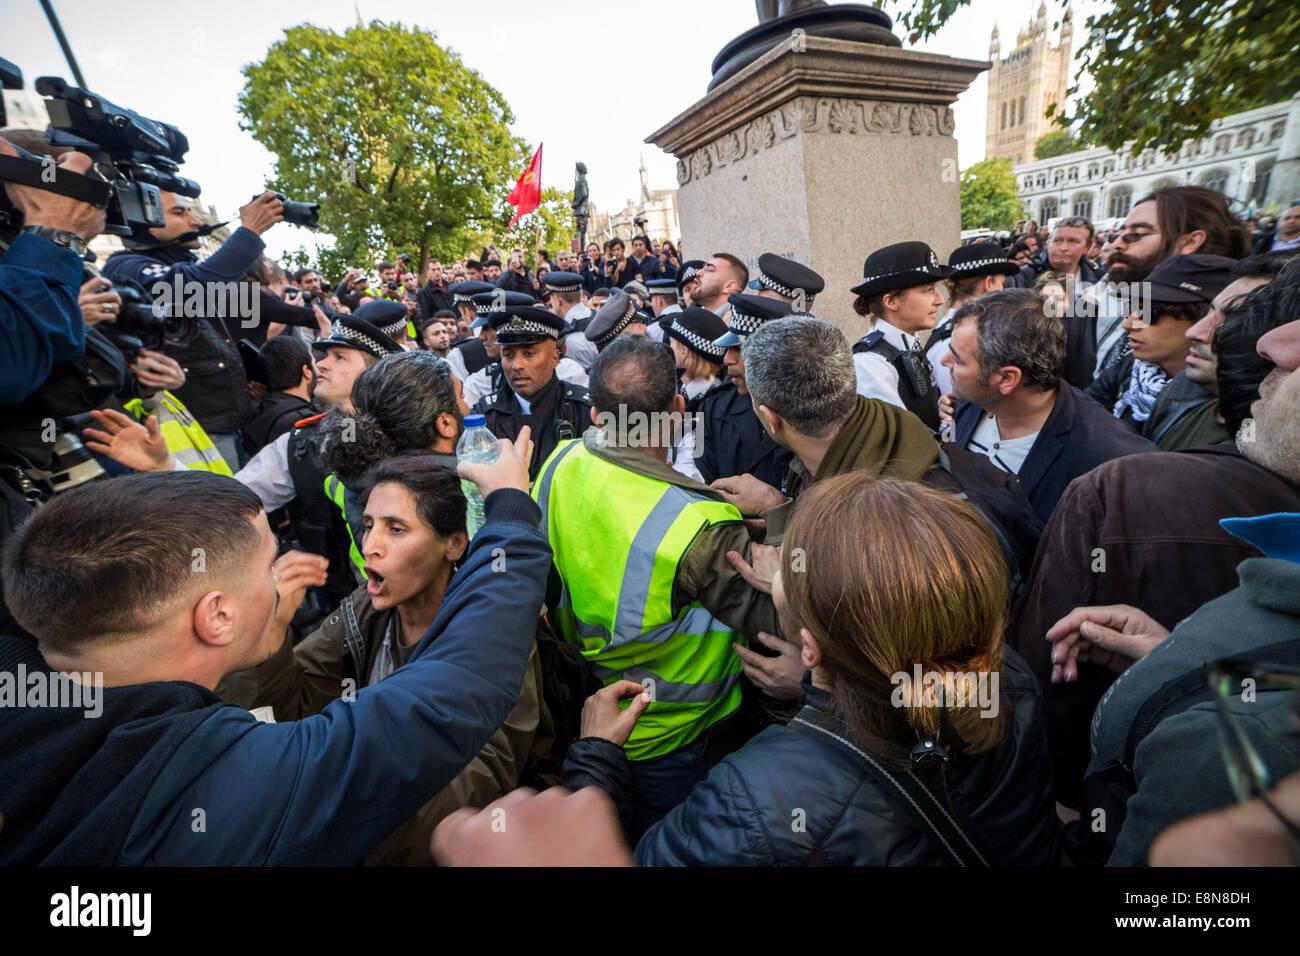 rencontres police Royaume-Uni